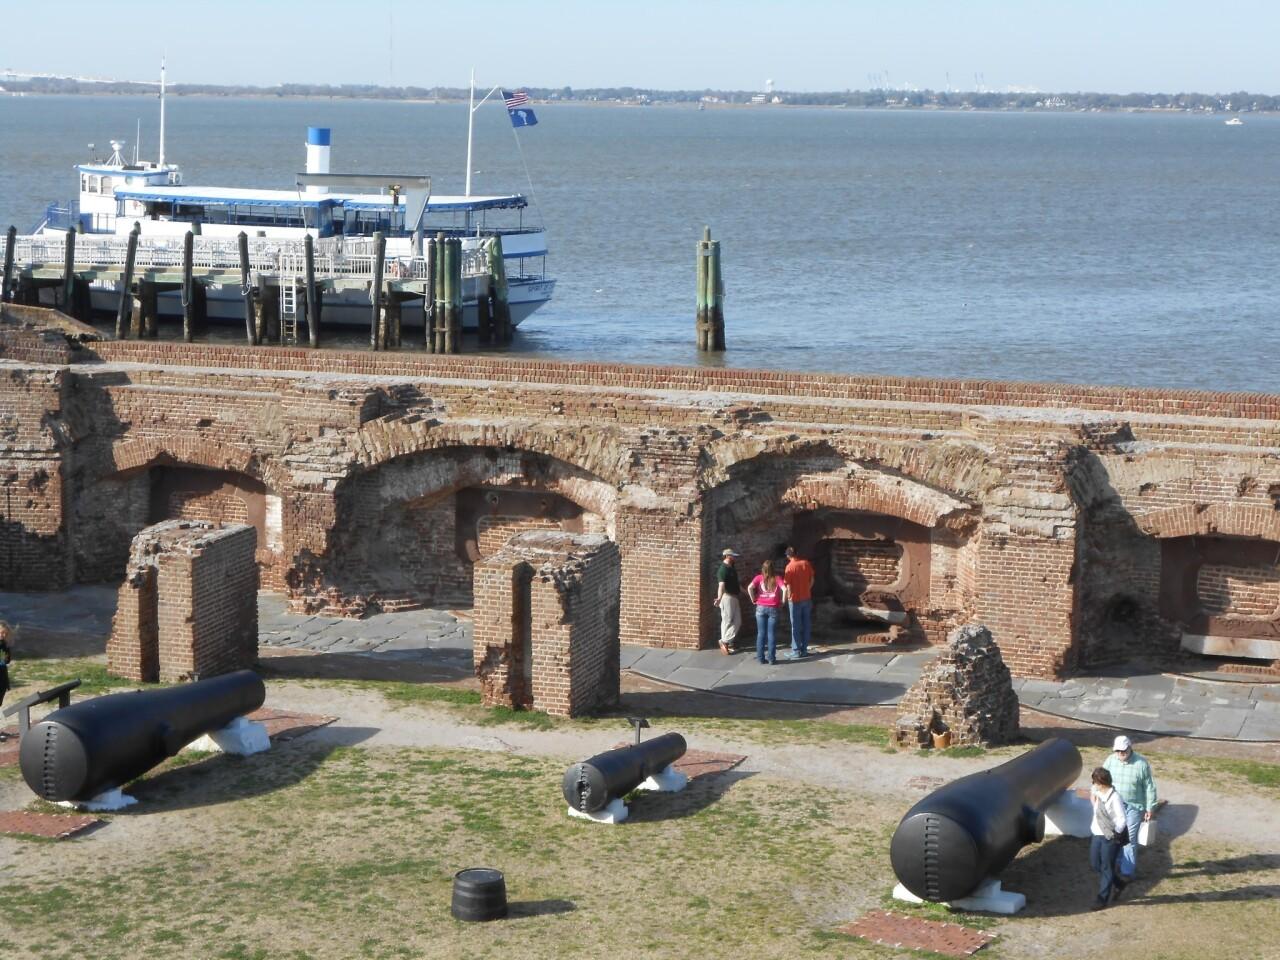 Fort Sumter in Charleston, S.C.